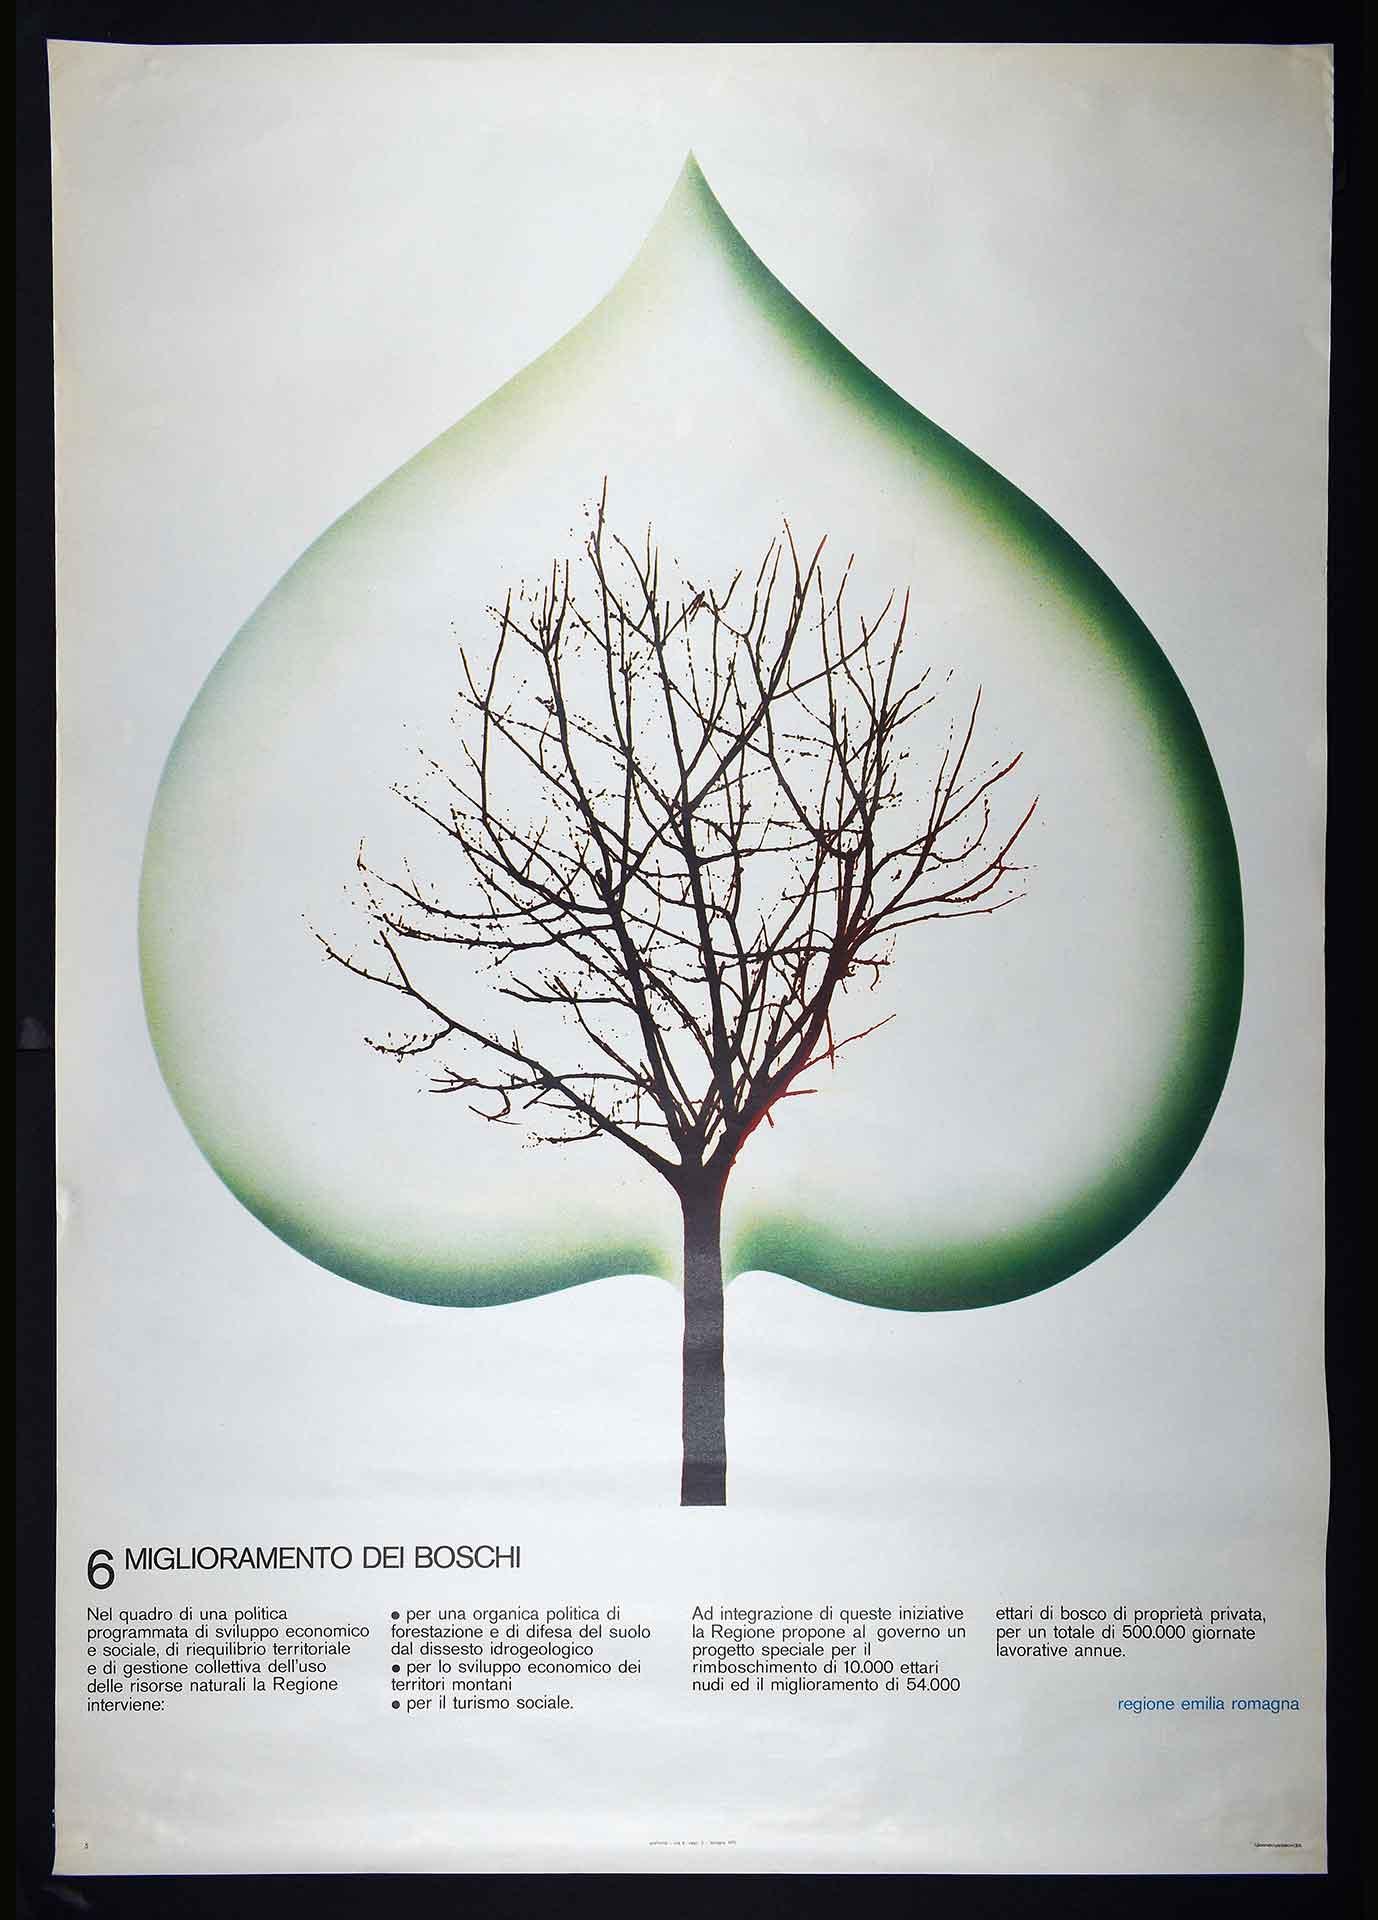 Regione Emilia-Romagna. Stampa Graficoop, Bologna. Campagna istituzionale.